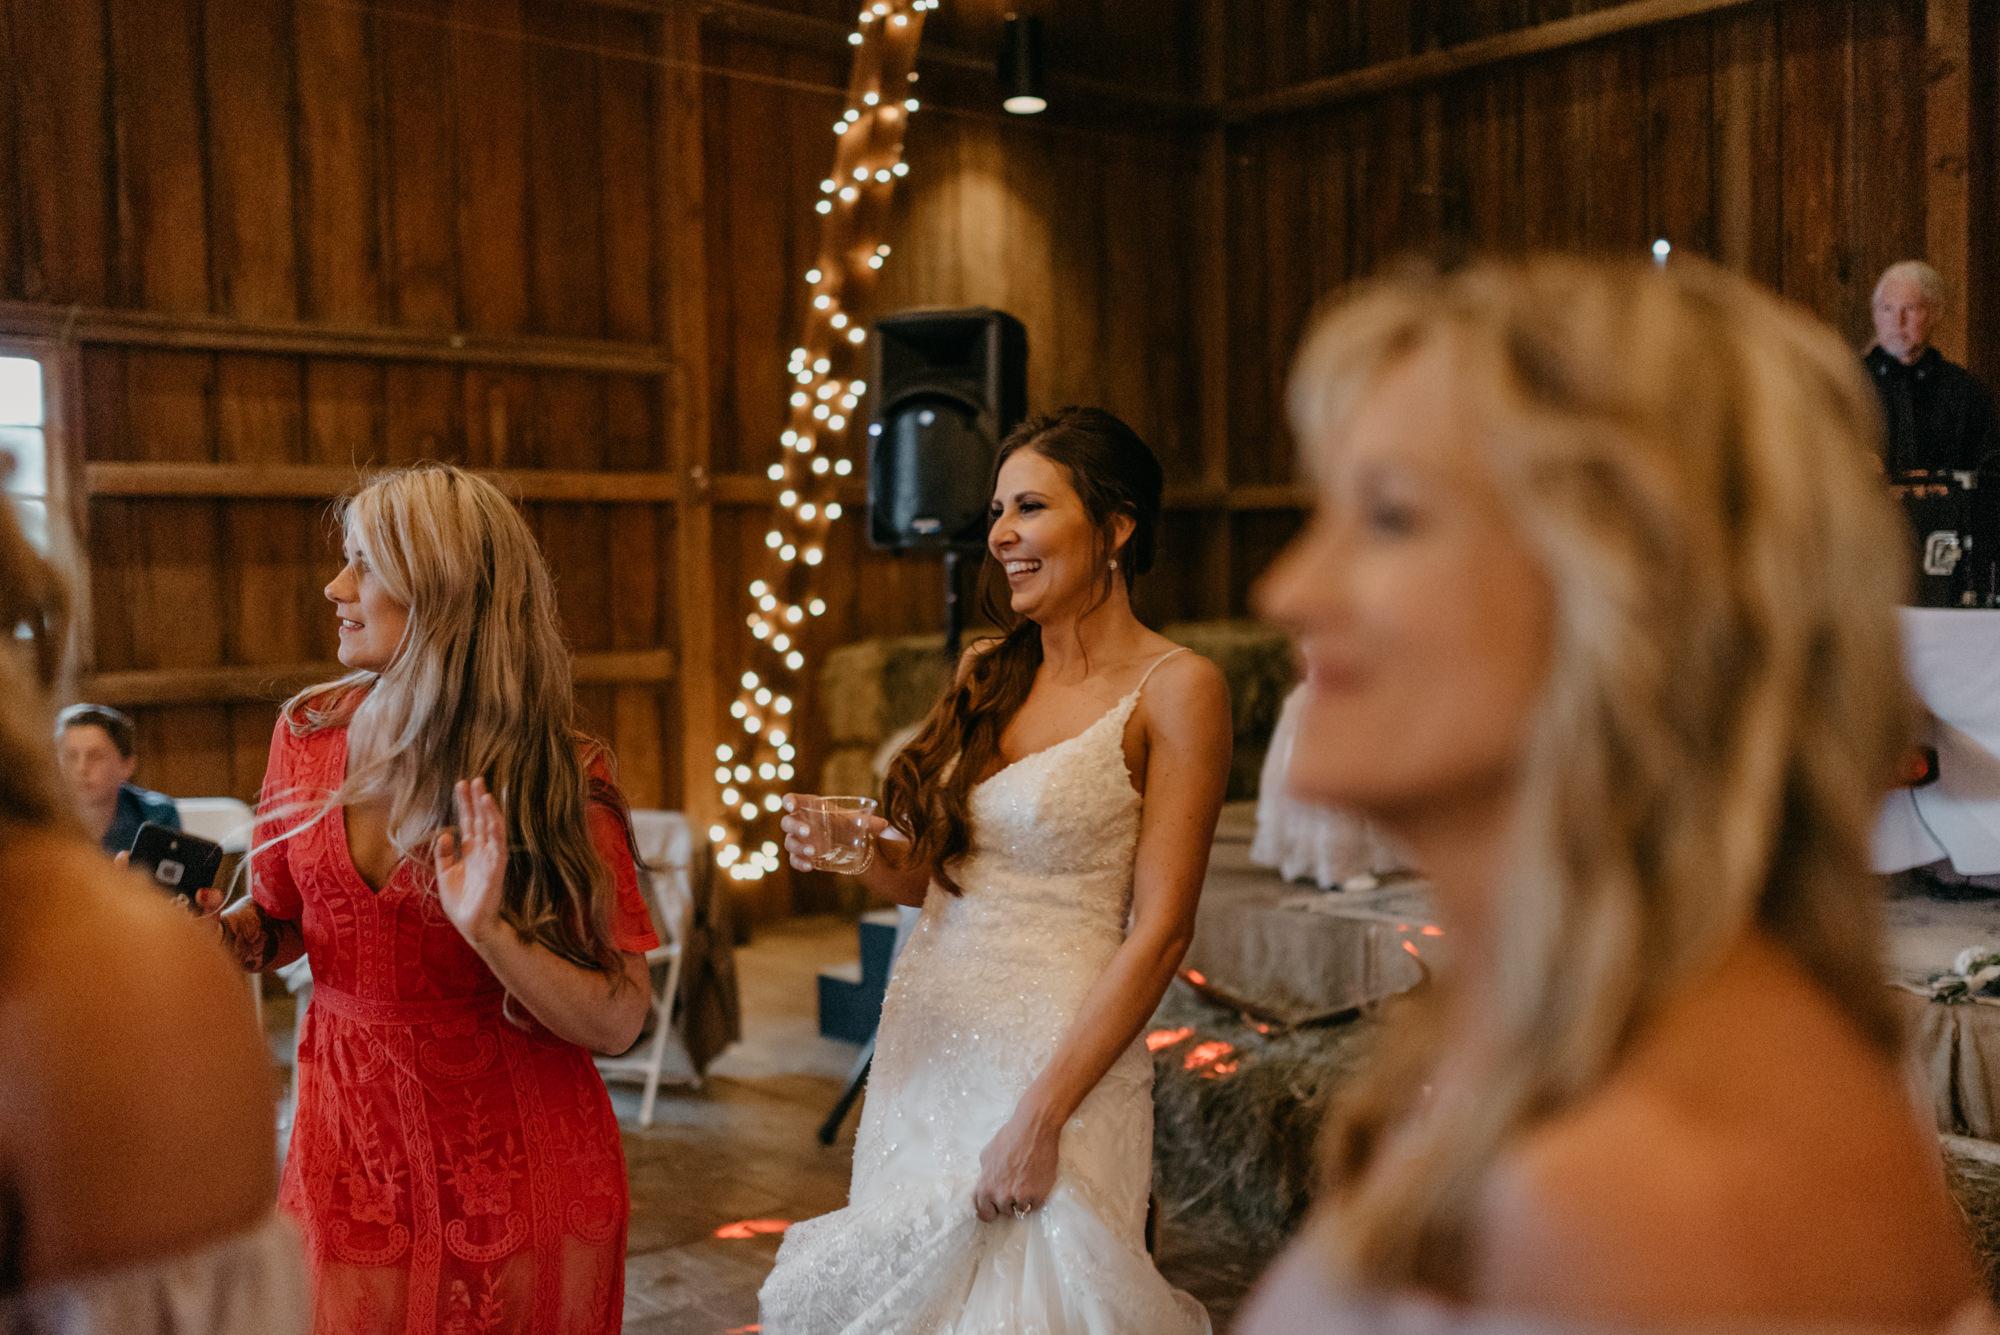 199-portland-northwest-wedding-bubble-exit-barn-string-lights.jpg